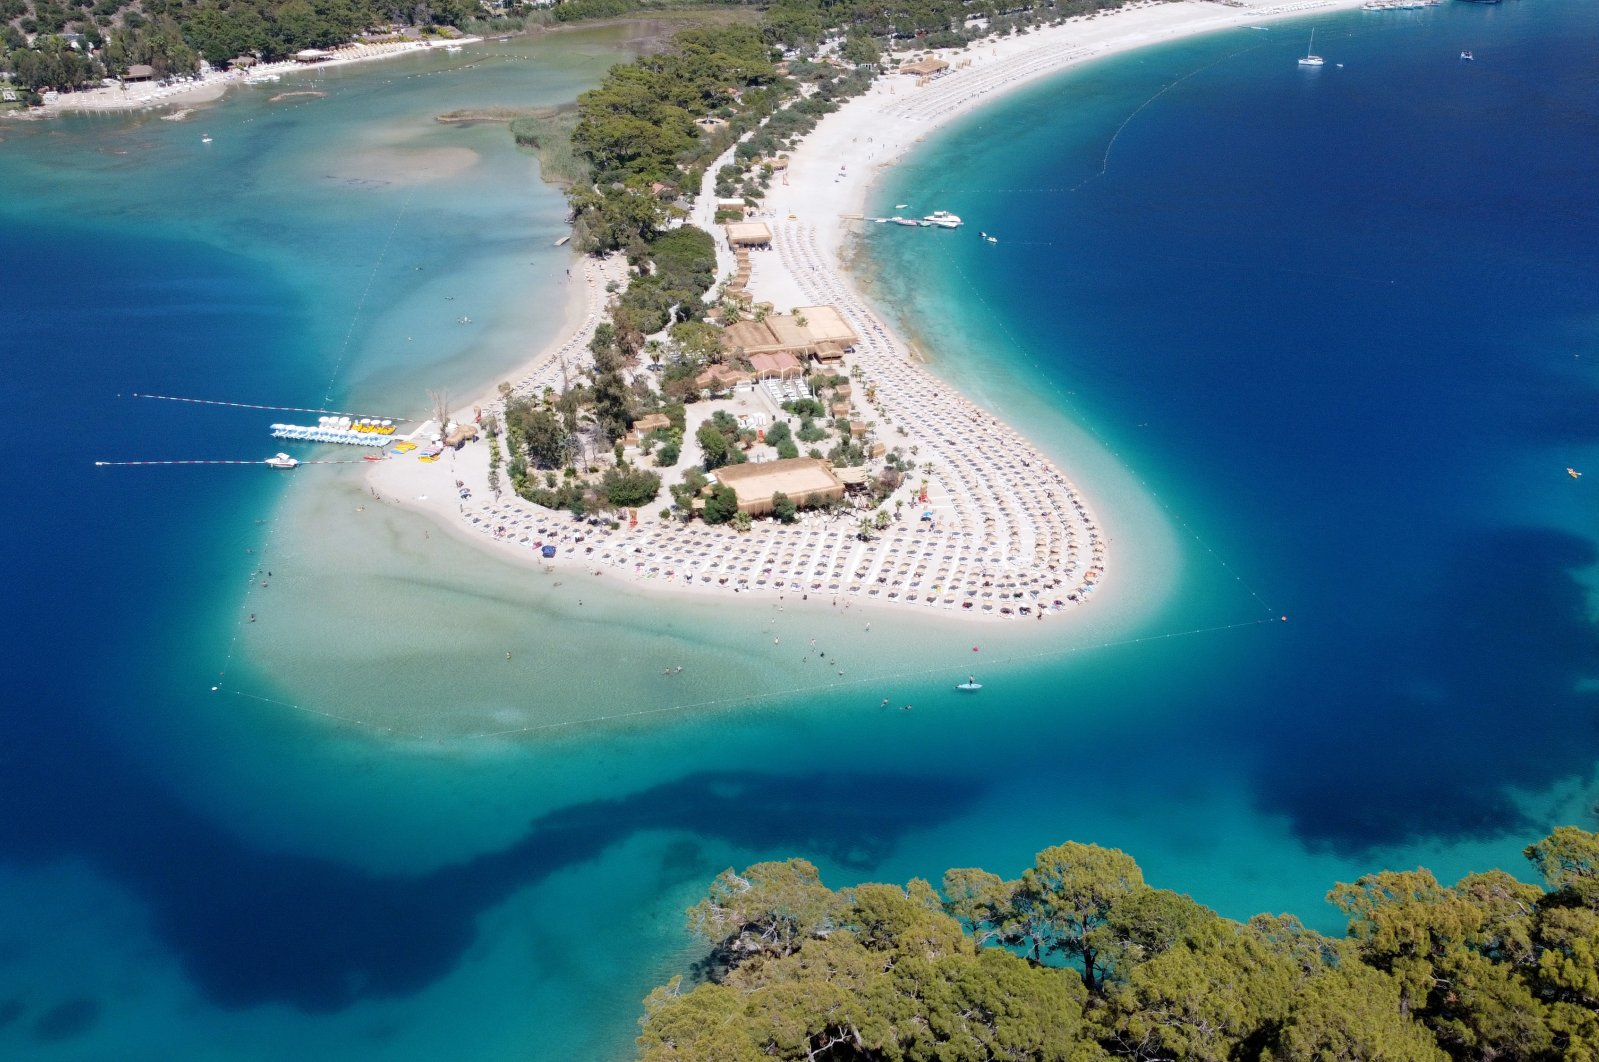 A view of a beach in Fethiye, Muğla province, southwestern Turkey, June 6, 2021. (AA Photo)